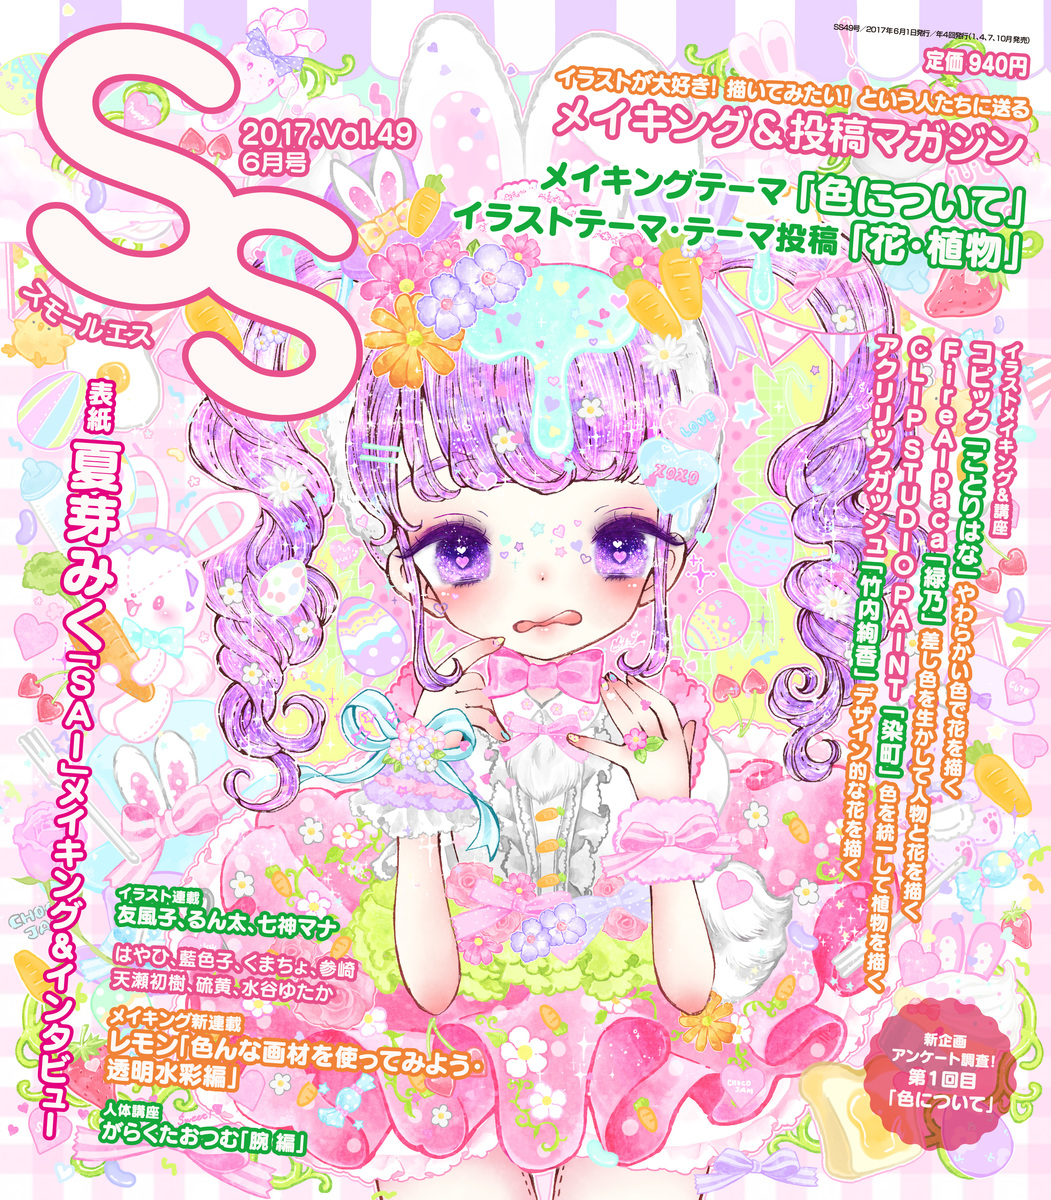 Ssスモールエス 最新号バックナンバー 季刊エスss公式サイト